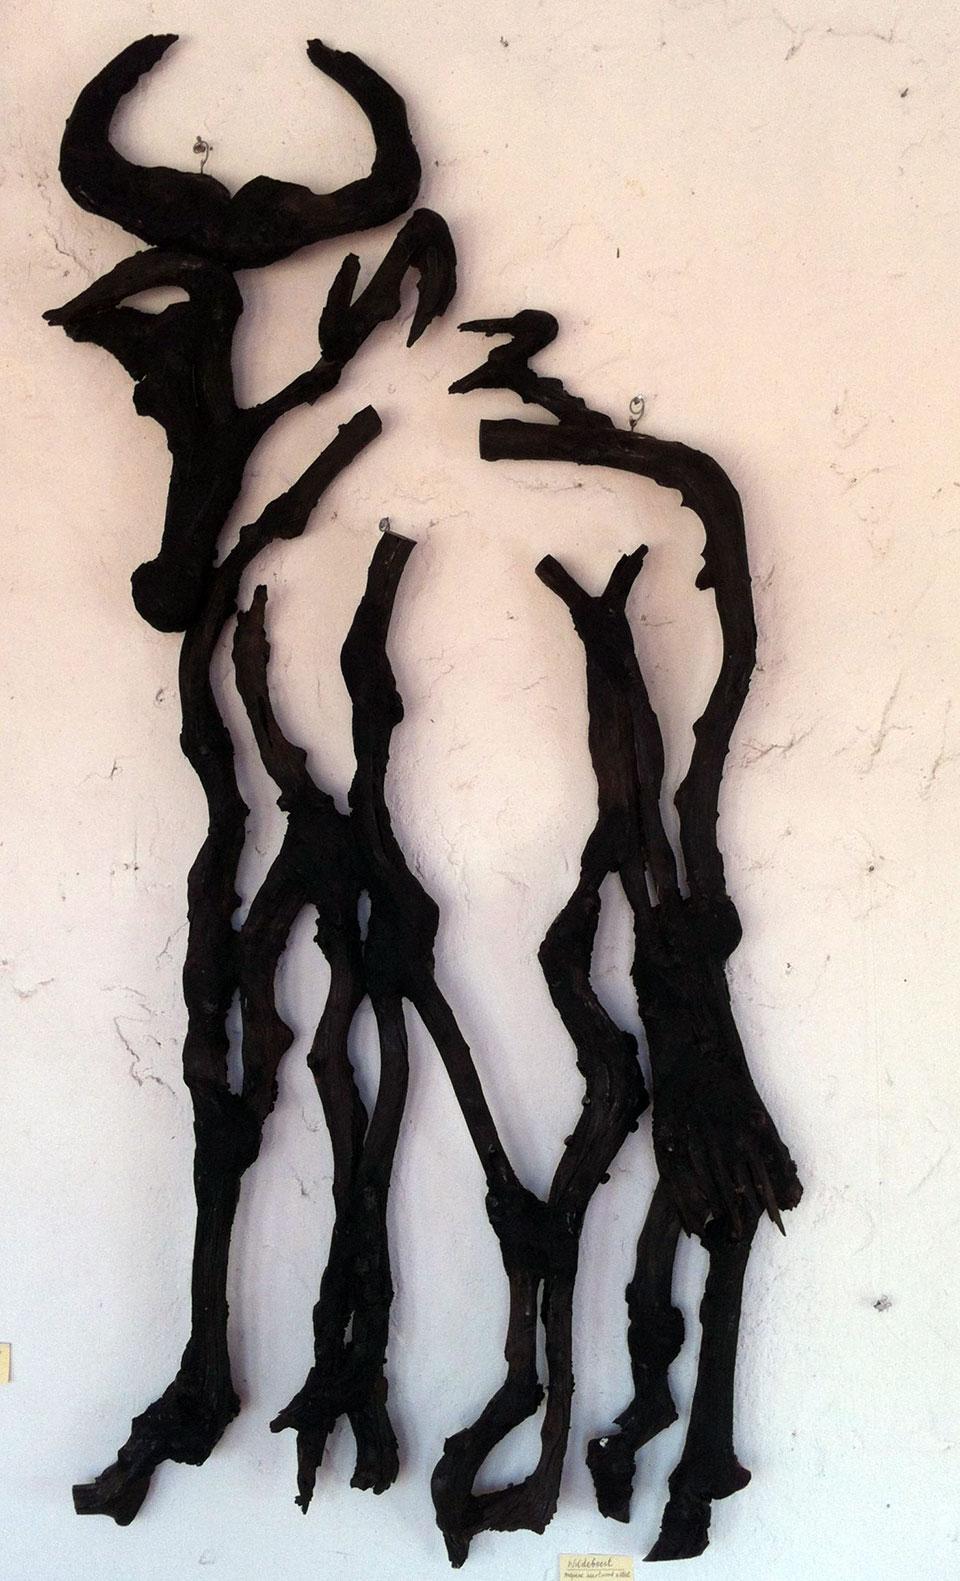 Wildebeest . Mopane heartwood and steel. 130 x 190cms. (2014)